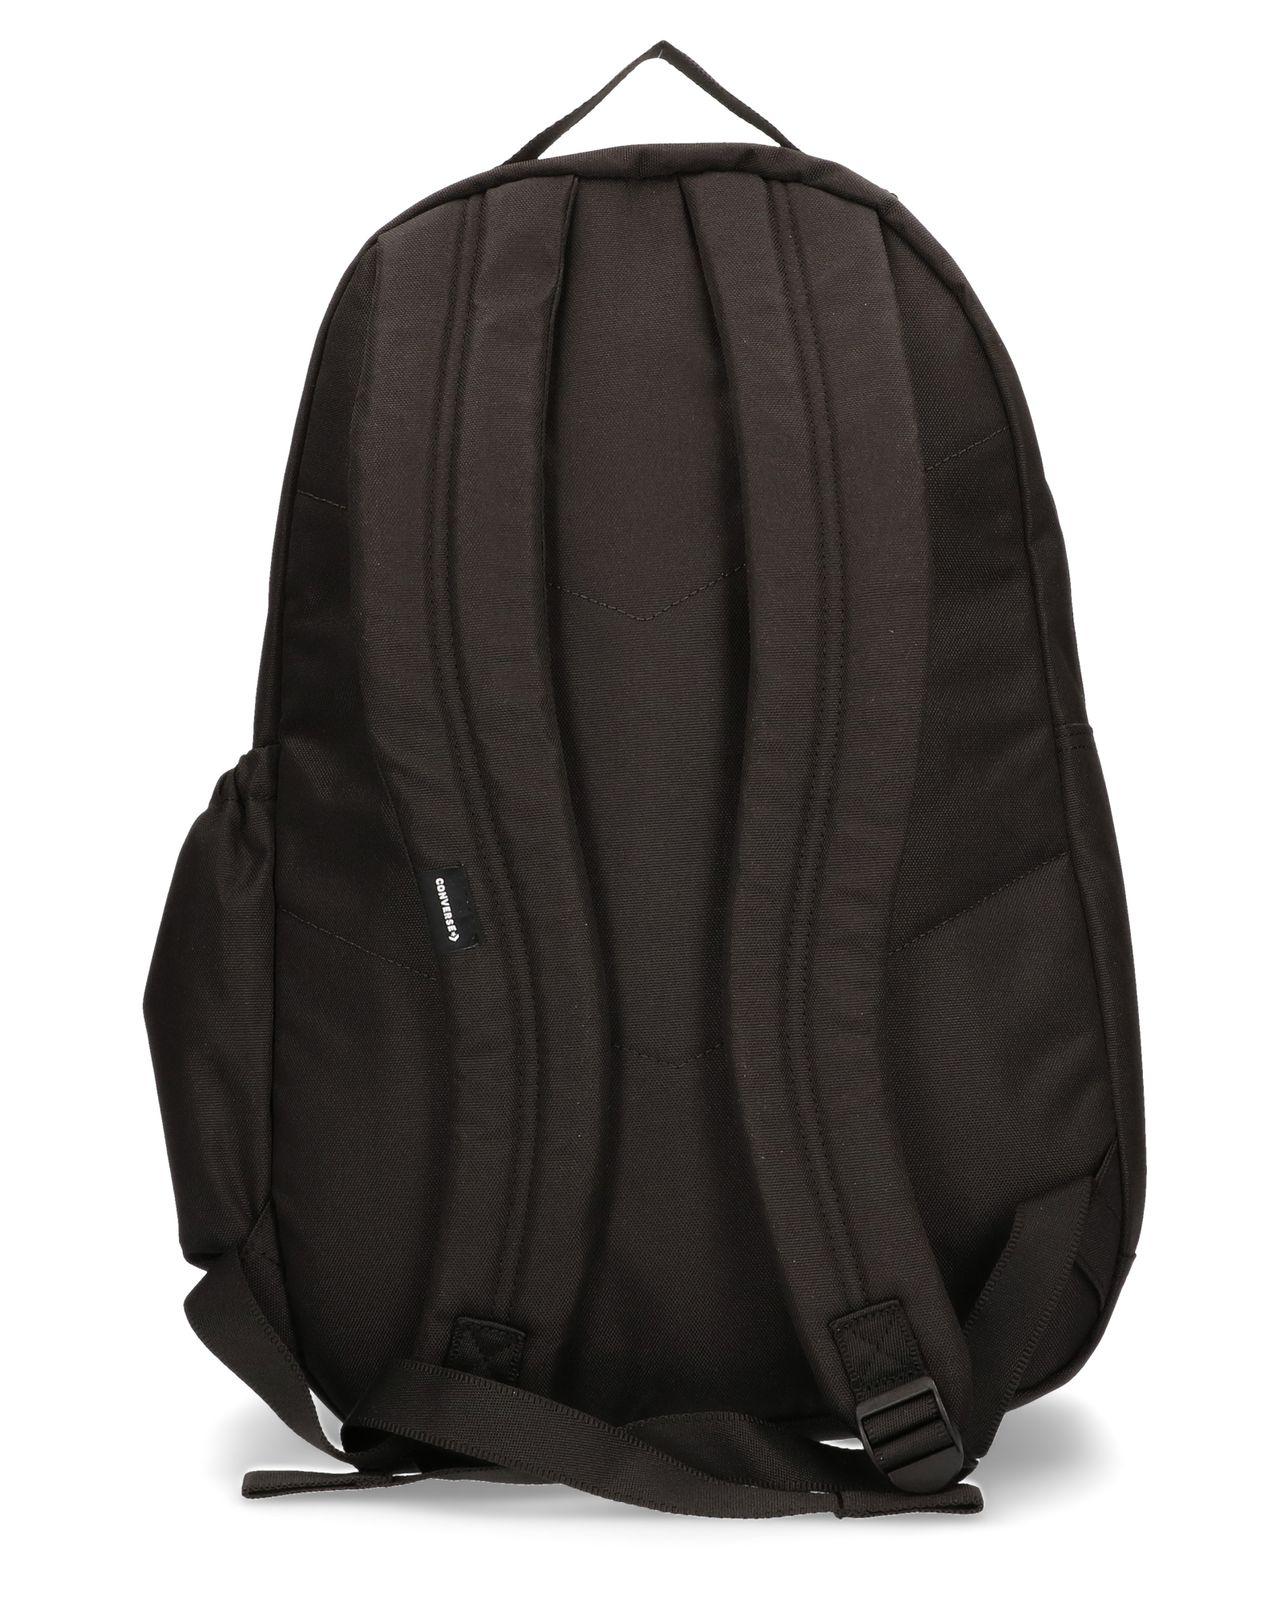 58d9f4121054 ... sofortüberweisung.deTap To CloseCONVERSE Go Backpack Black   35